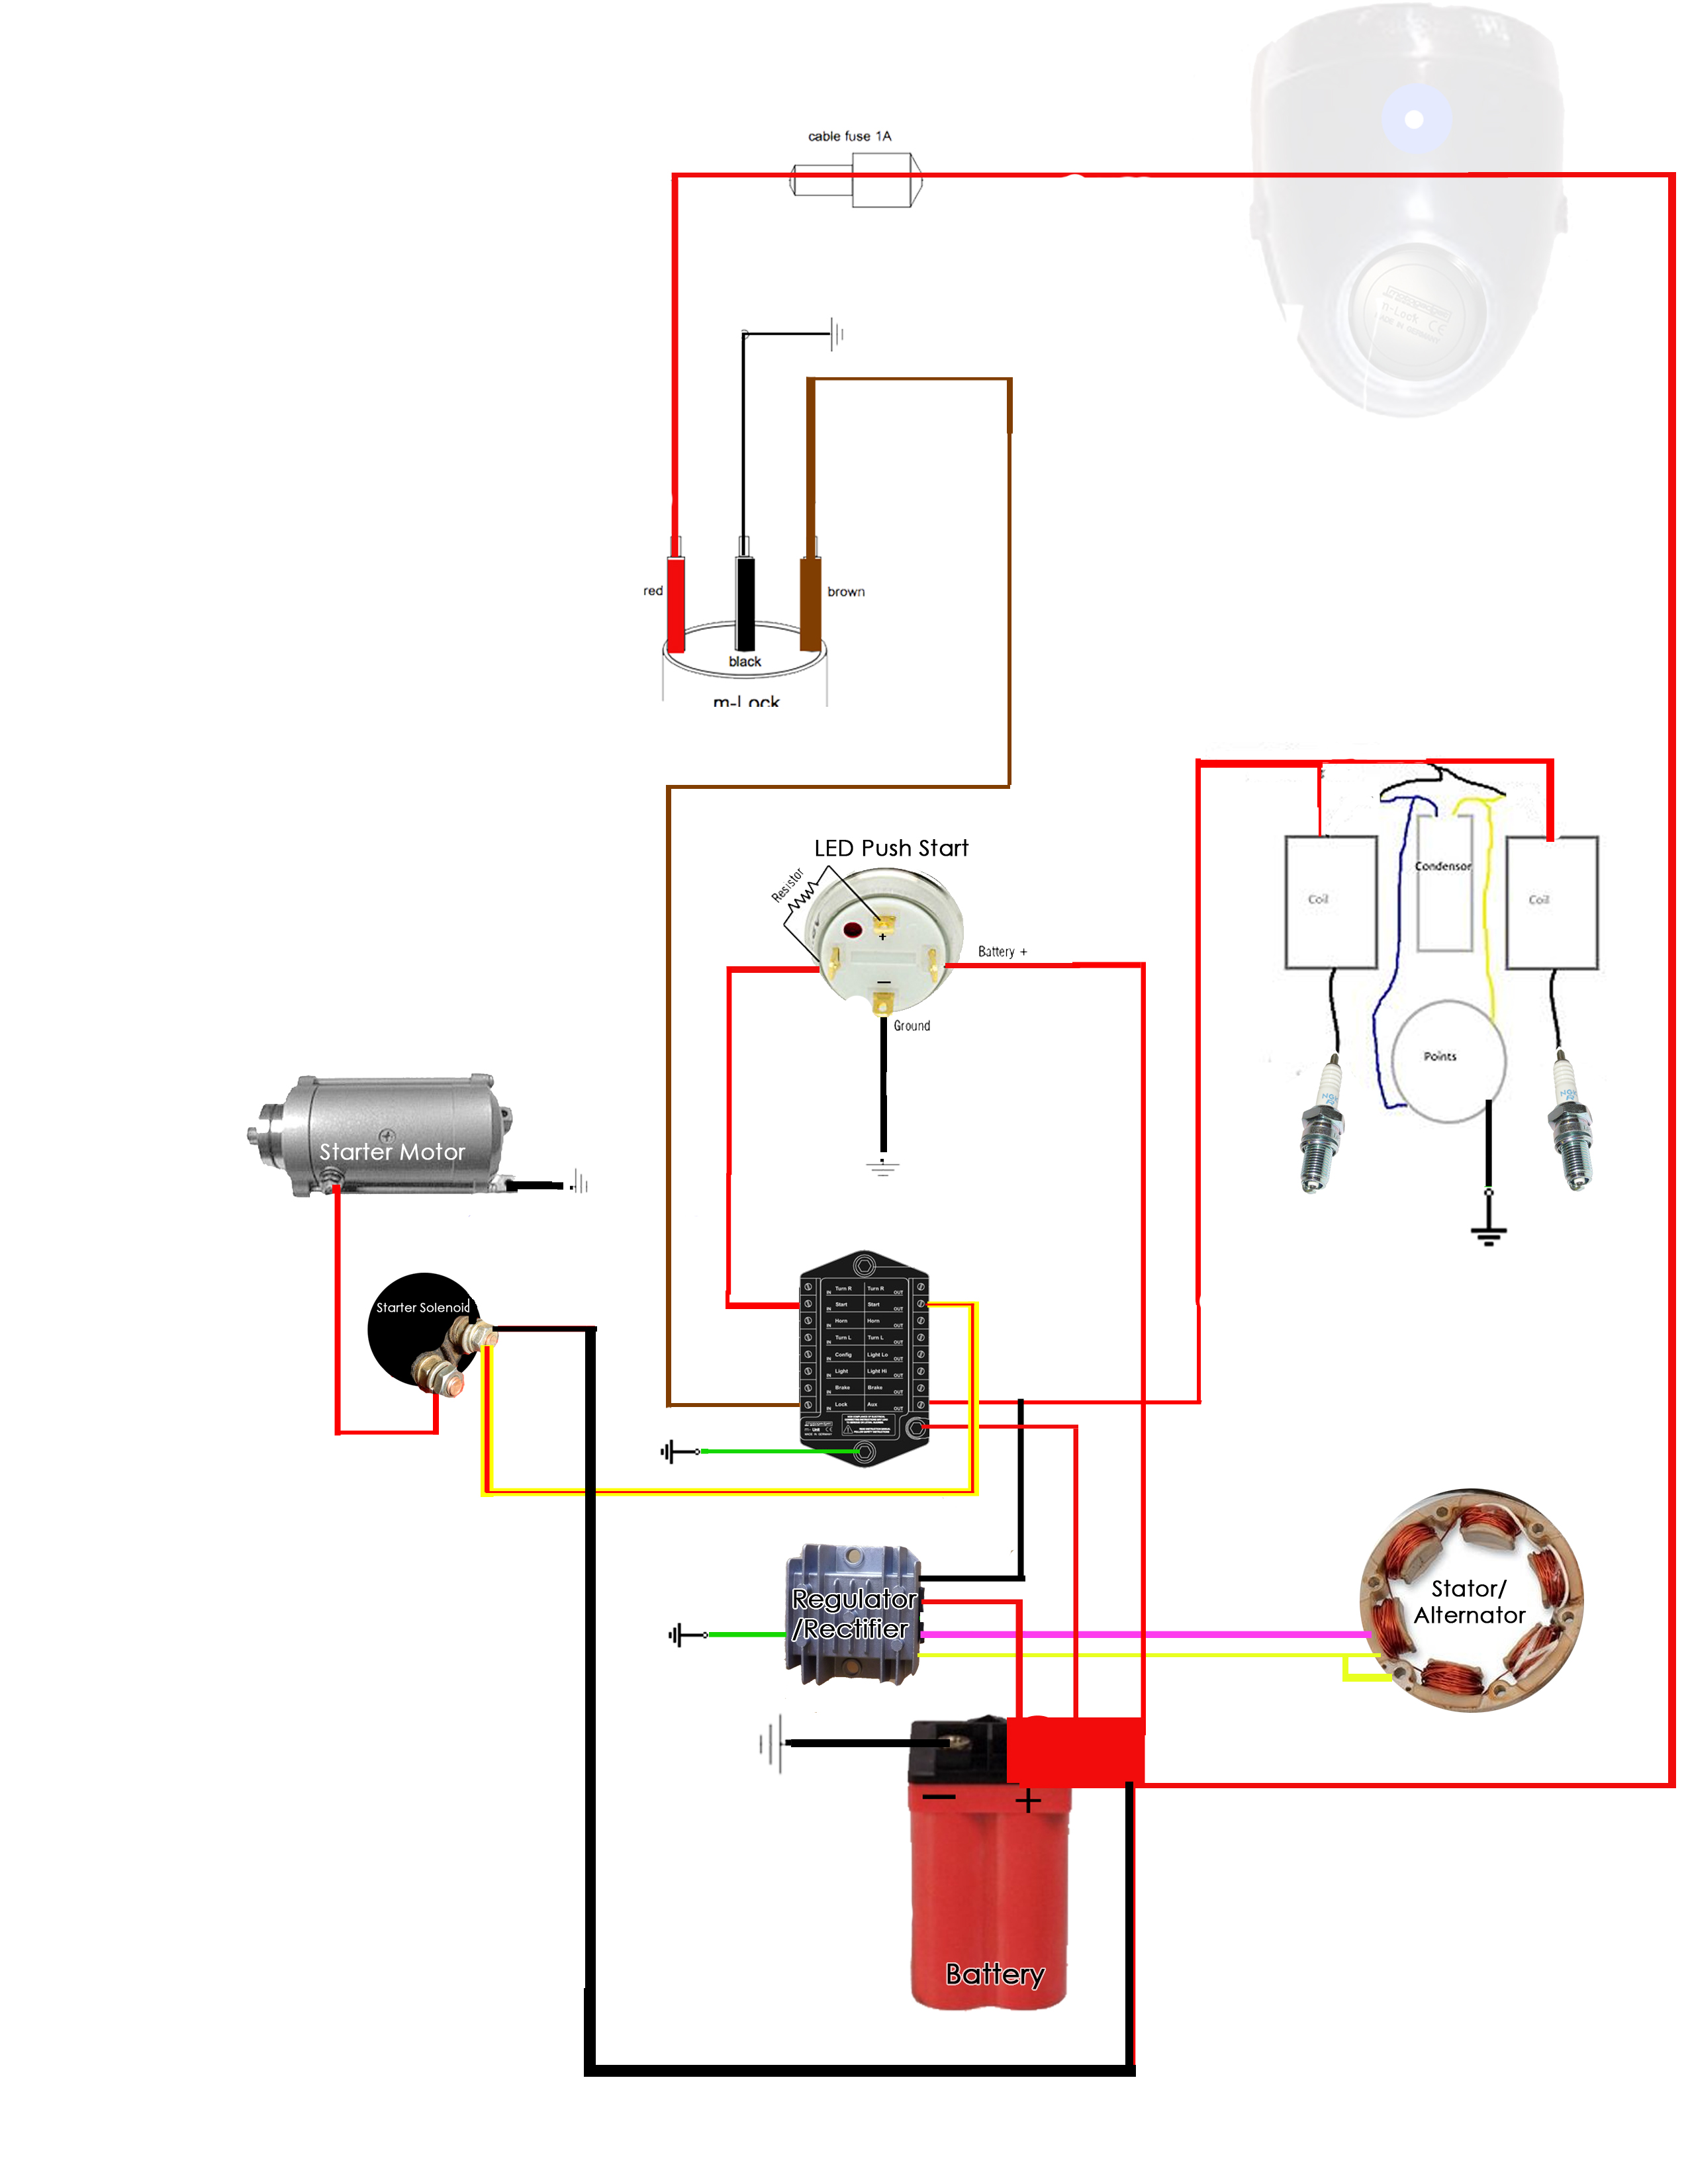 Honda Cl 350 Wiring Data Schematic 1969 Cb350 Diagram Schedmatic Cafe Project Attachments Rh Hondatwins Net